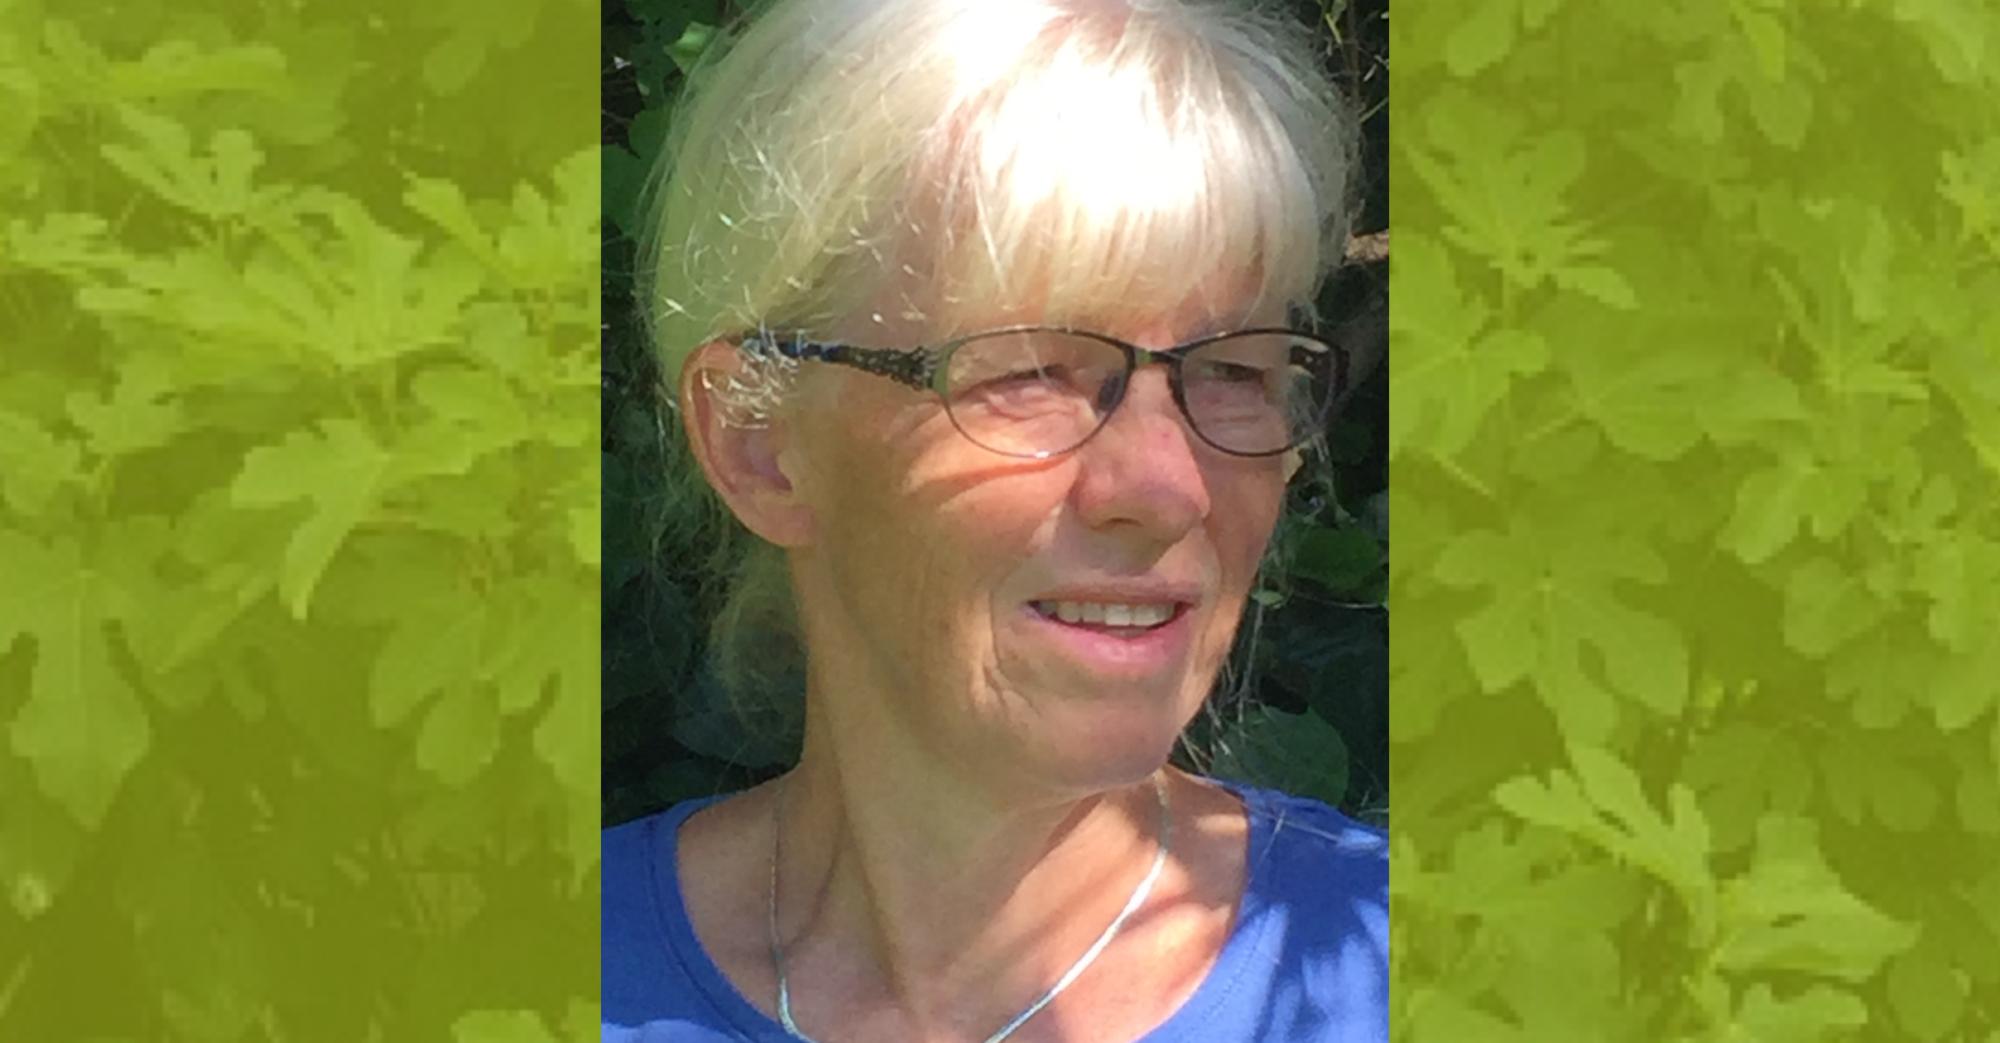 Lisbeth Wemmelund